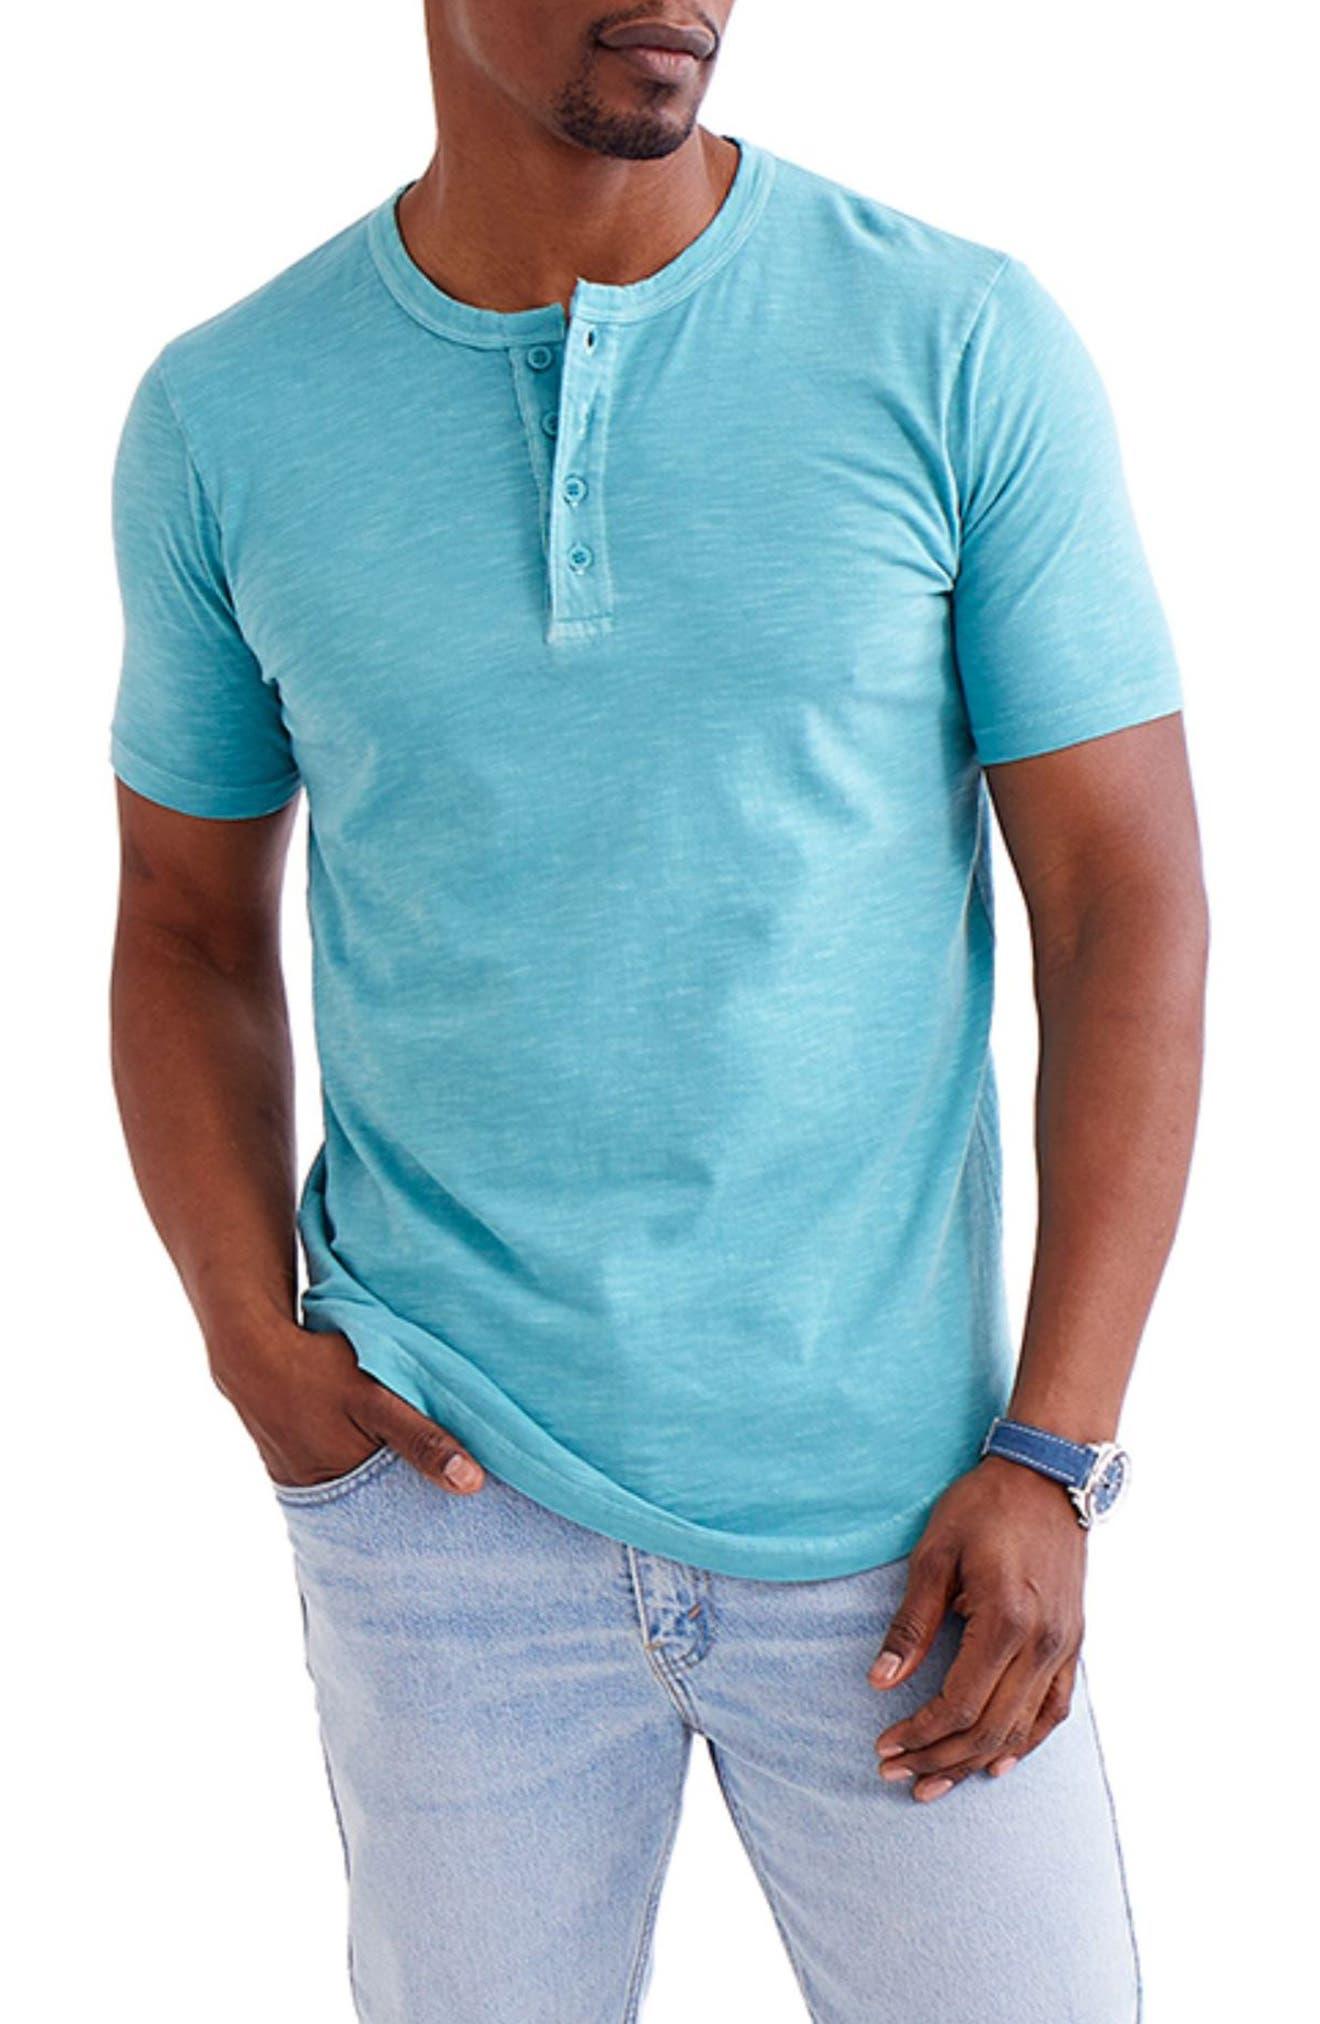 Men's Scallop Short Sleeve Henley